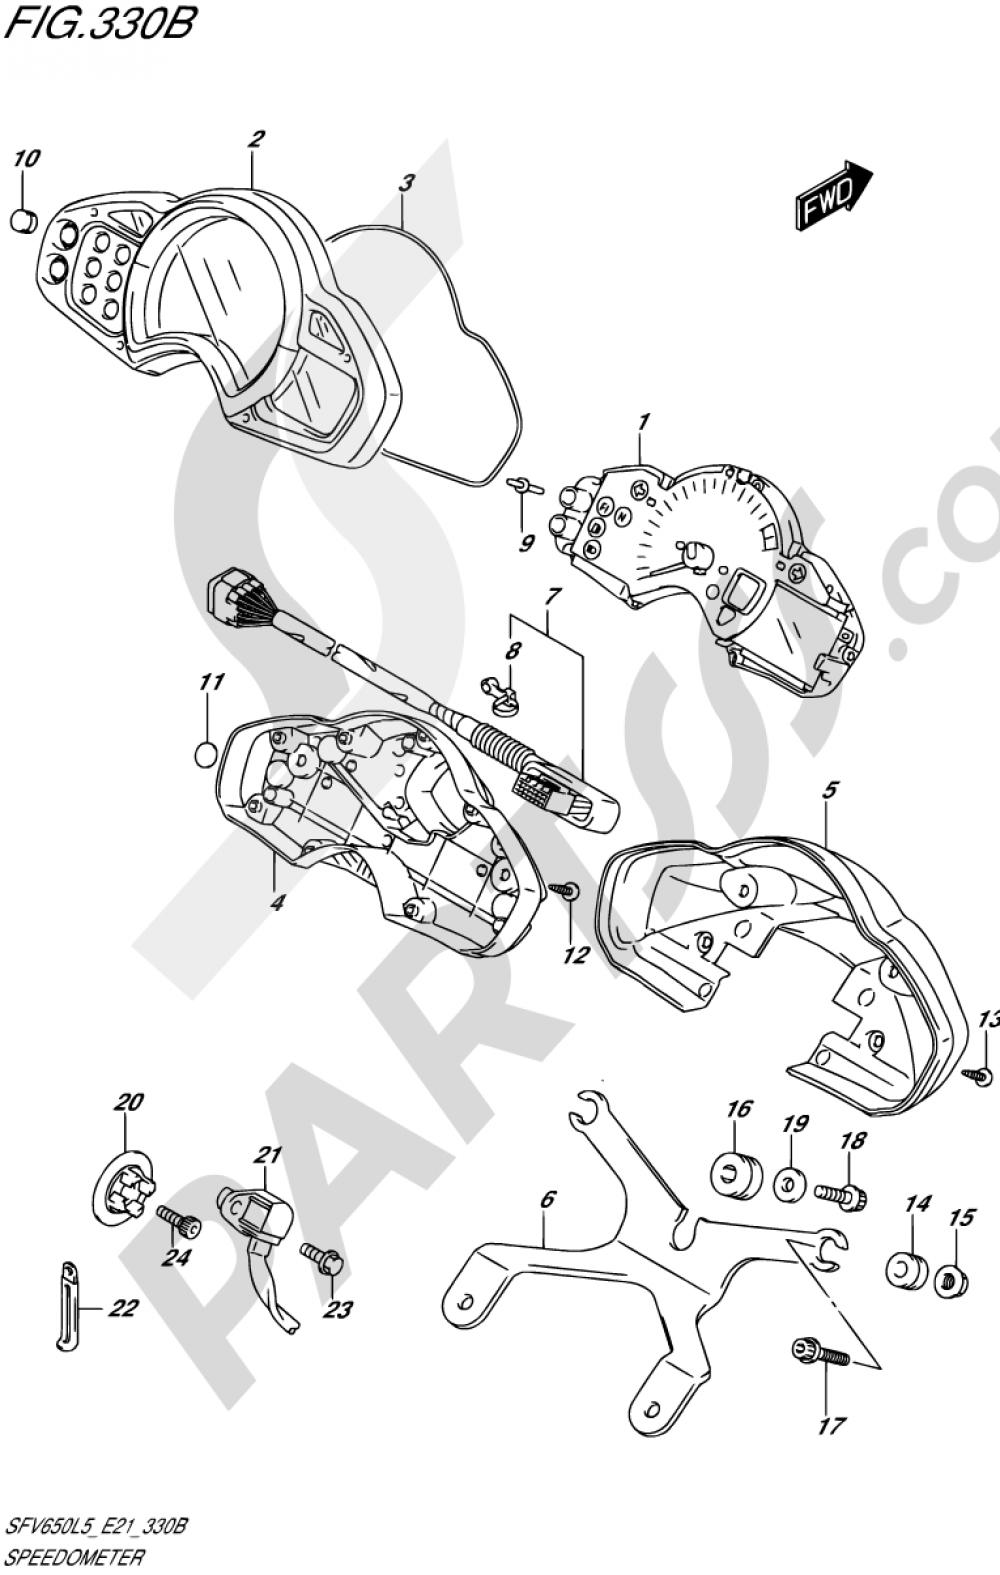 330B - SPEEDOMETER (SFV650AL5 E21) Suzuki GLADIUS SFV650A 2015